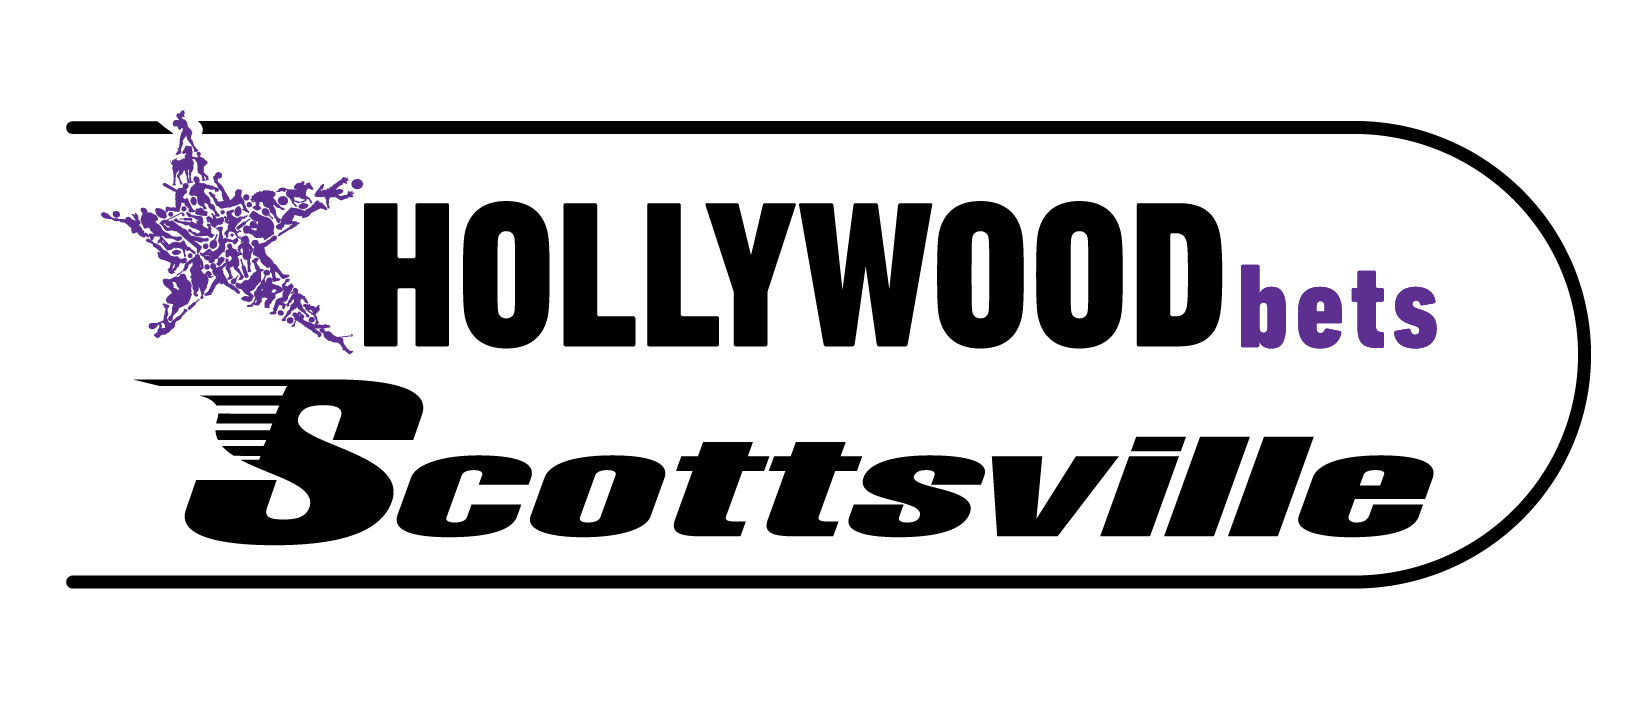 Hollywoodbets Scottsville